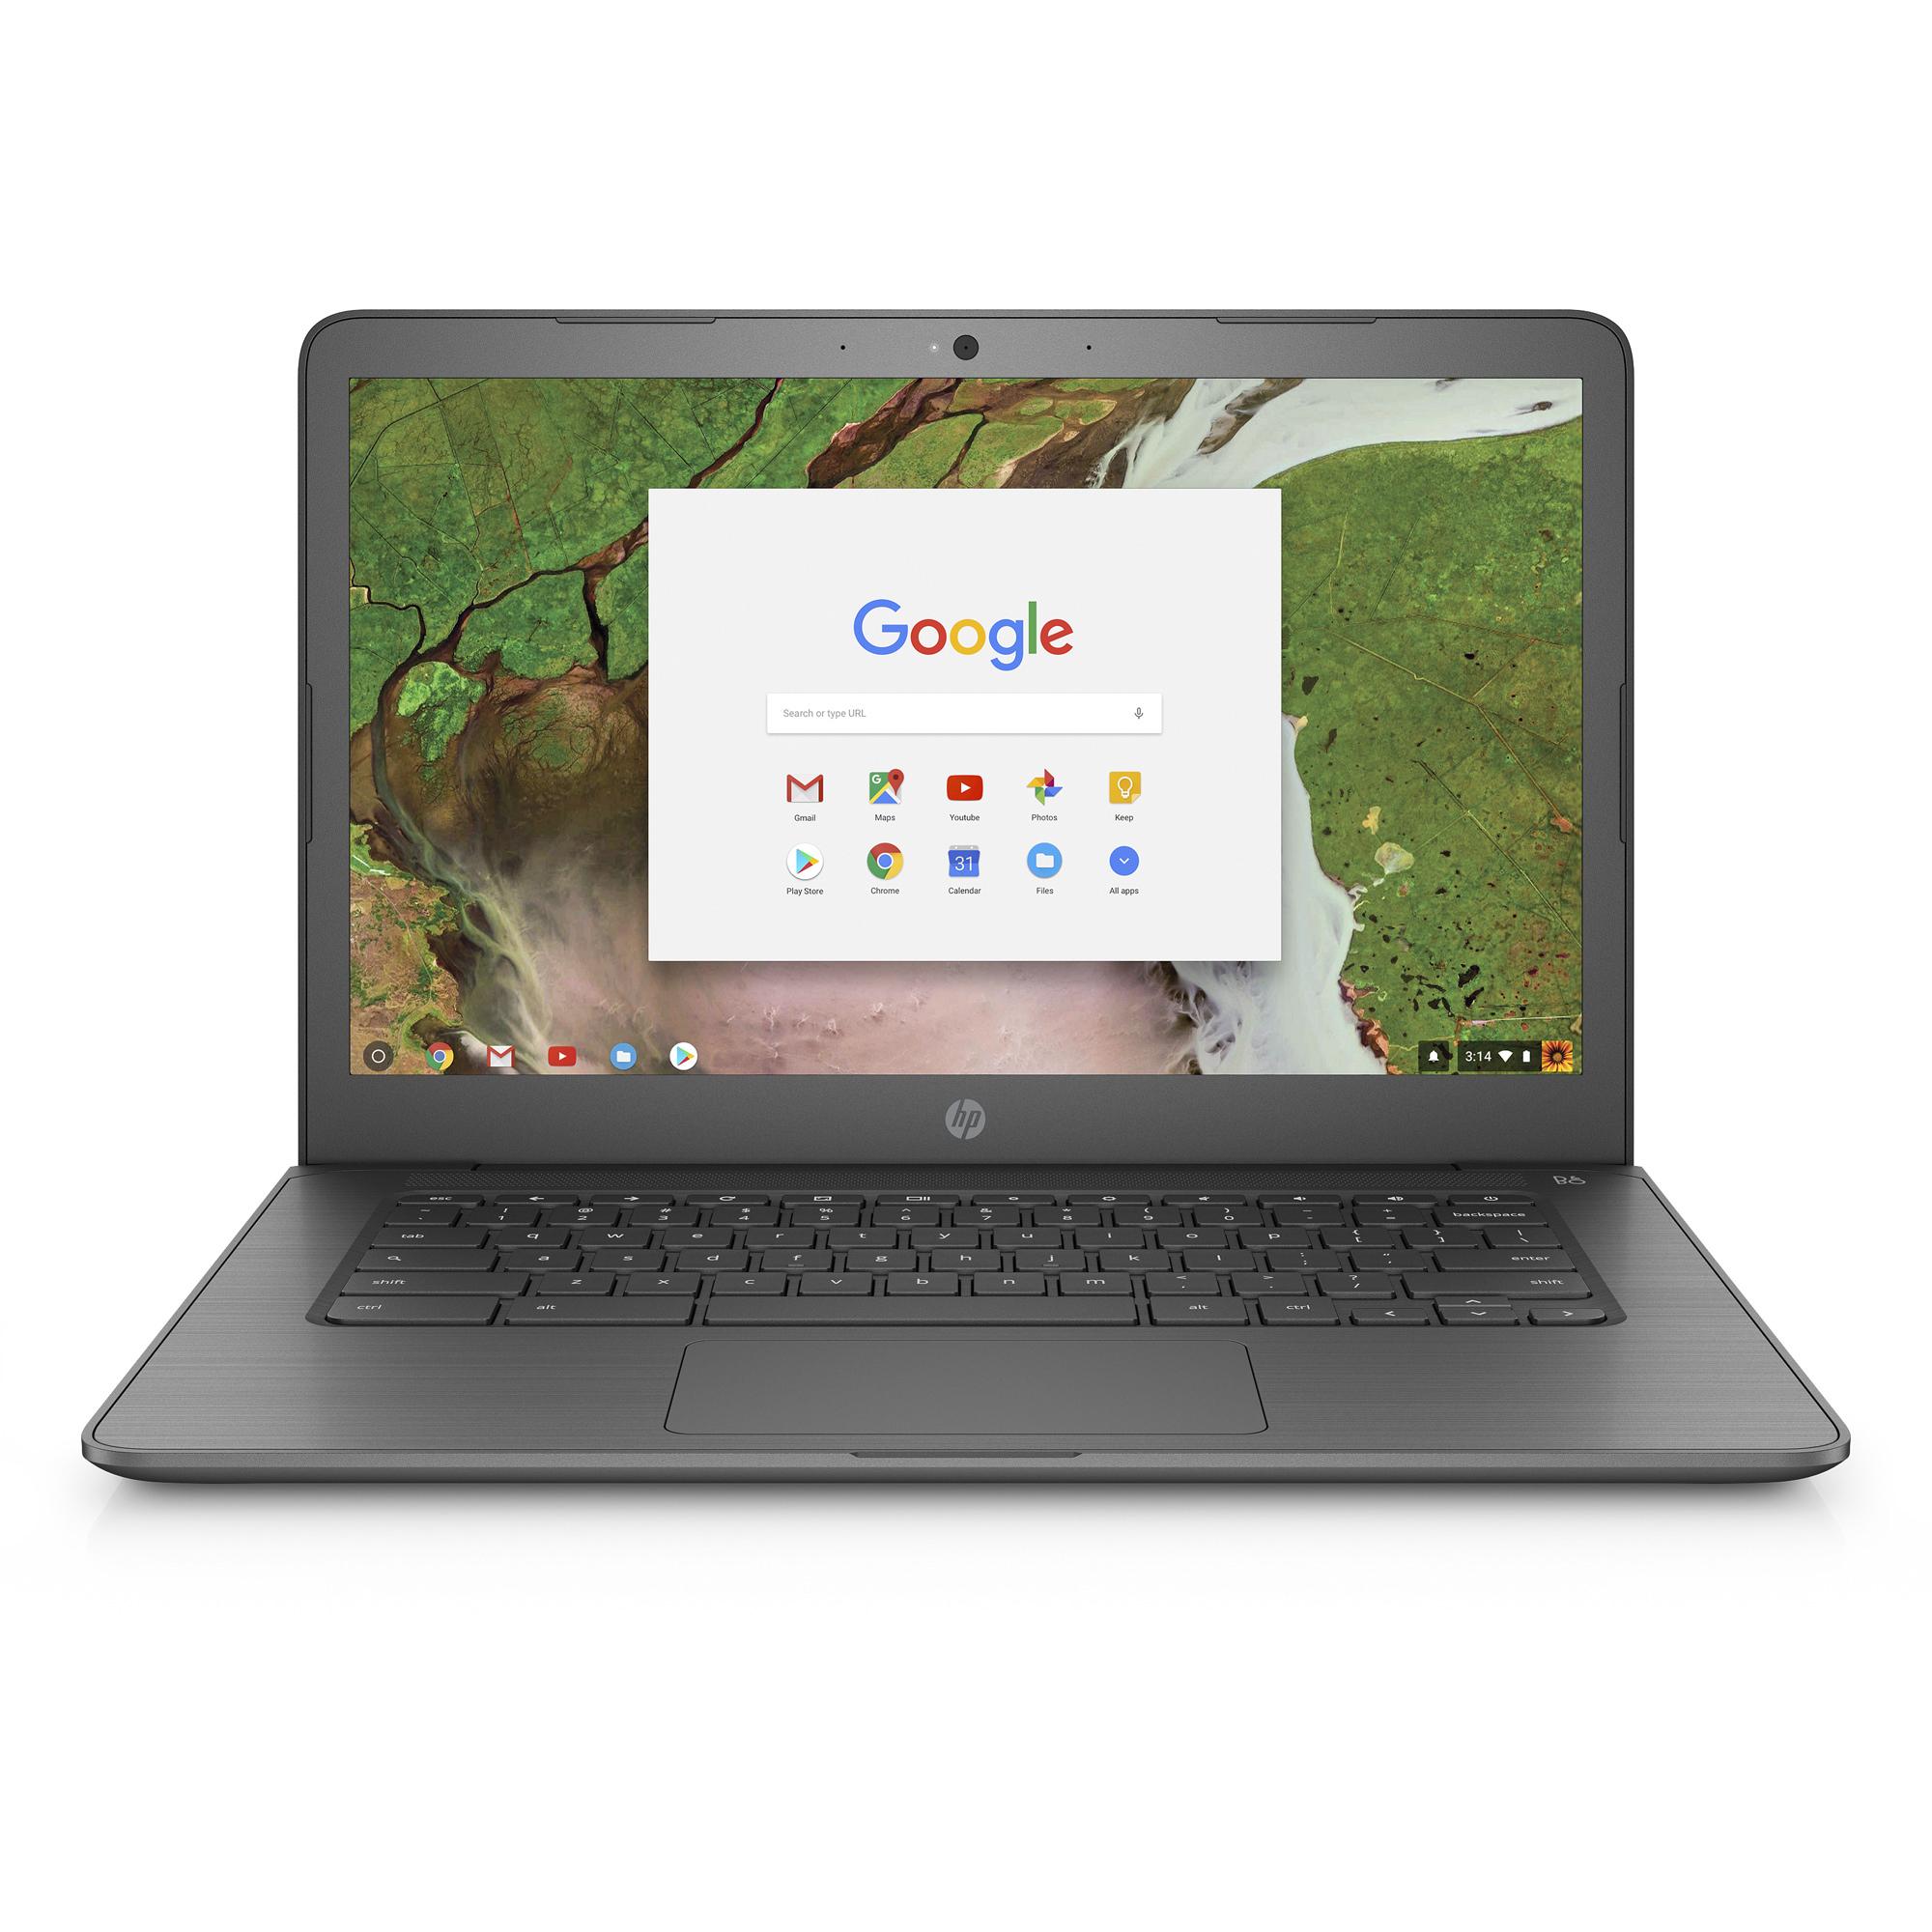 HP 14-CA020NR Chalkboard Gray 14 inch HD Chromebook, Chrome OS, Celeron N3350 DC Processor, 4GB Memory, 16GB eMMC Storage, UMA graphics, B&O Play